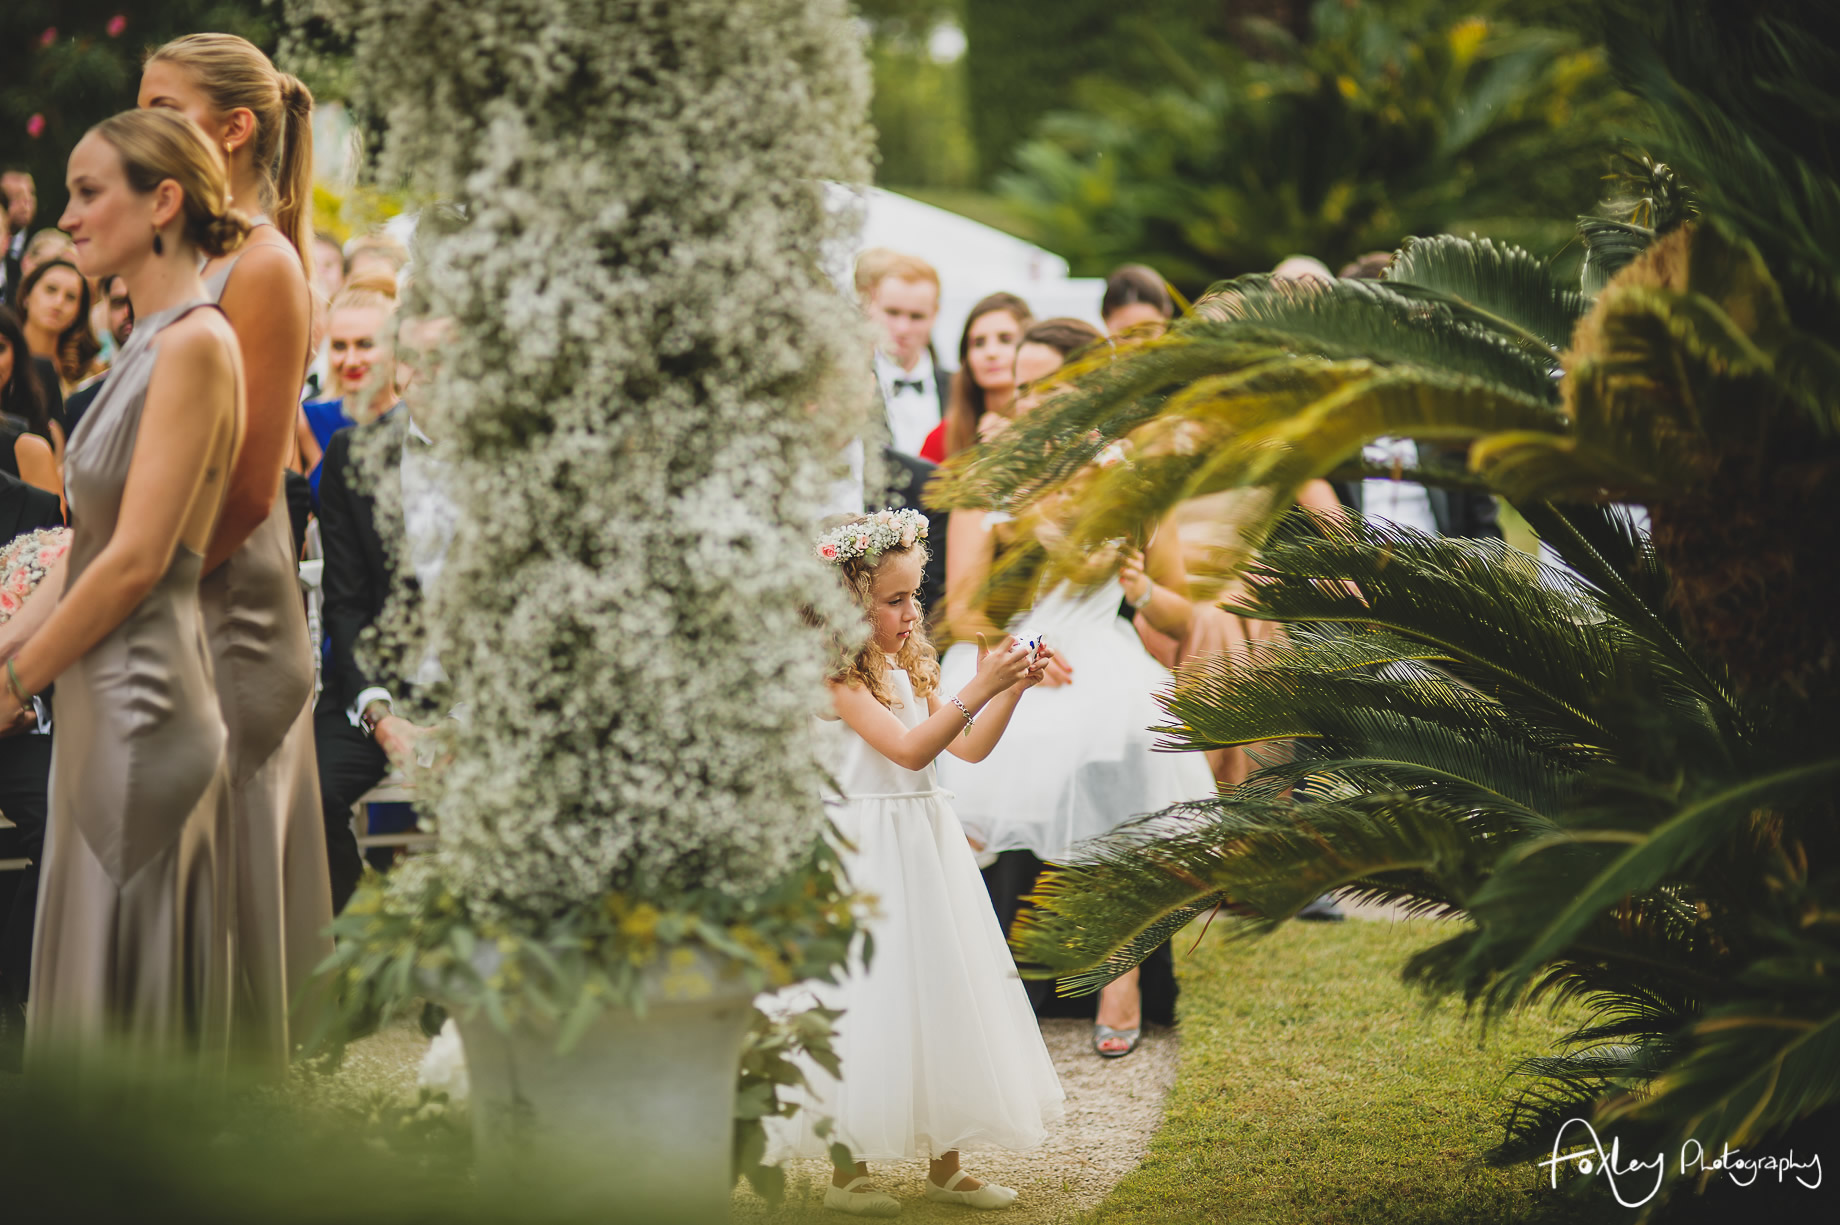 Jil and Will's Wedding at Villa Ephrussi De Rothschild 101